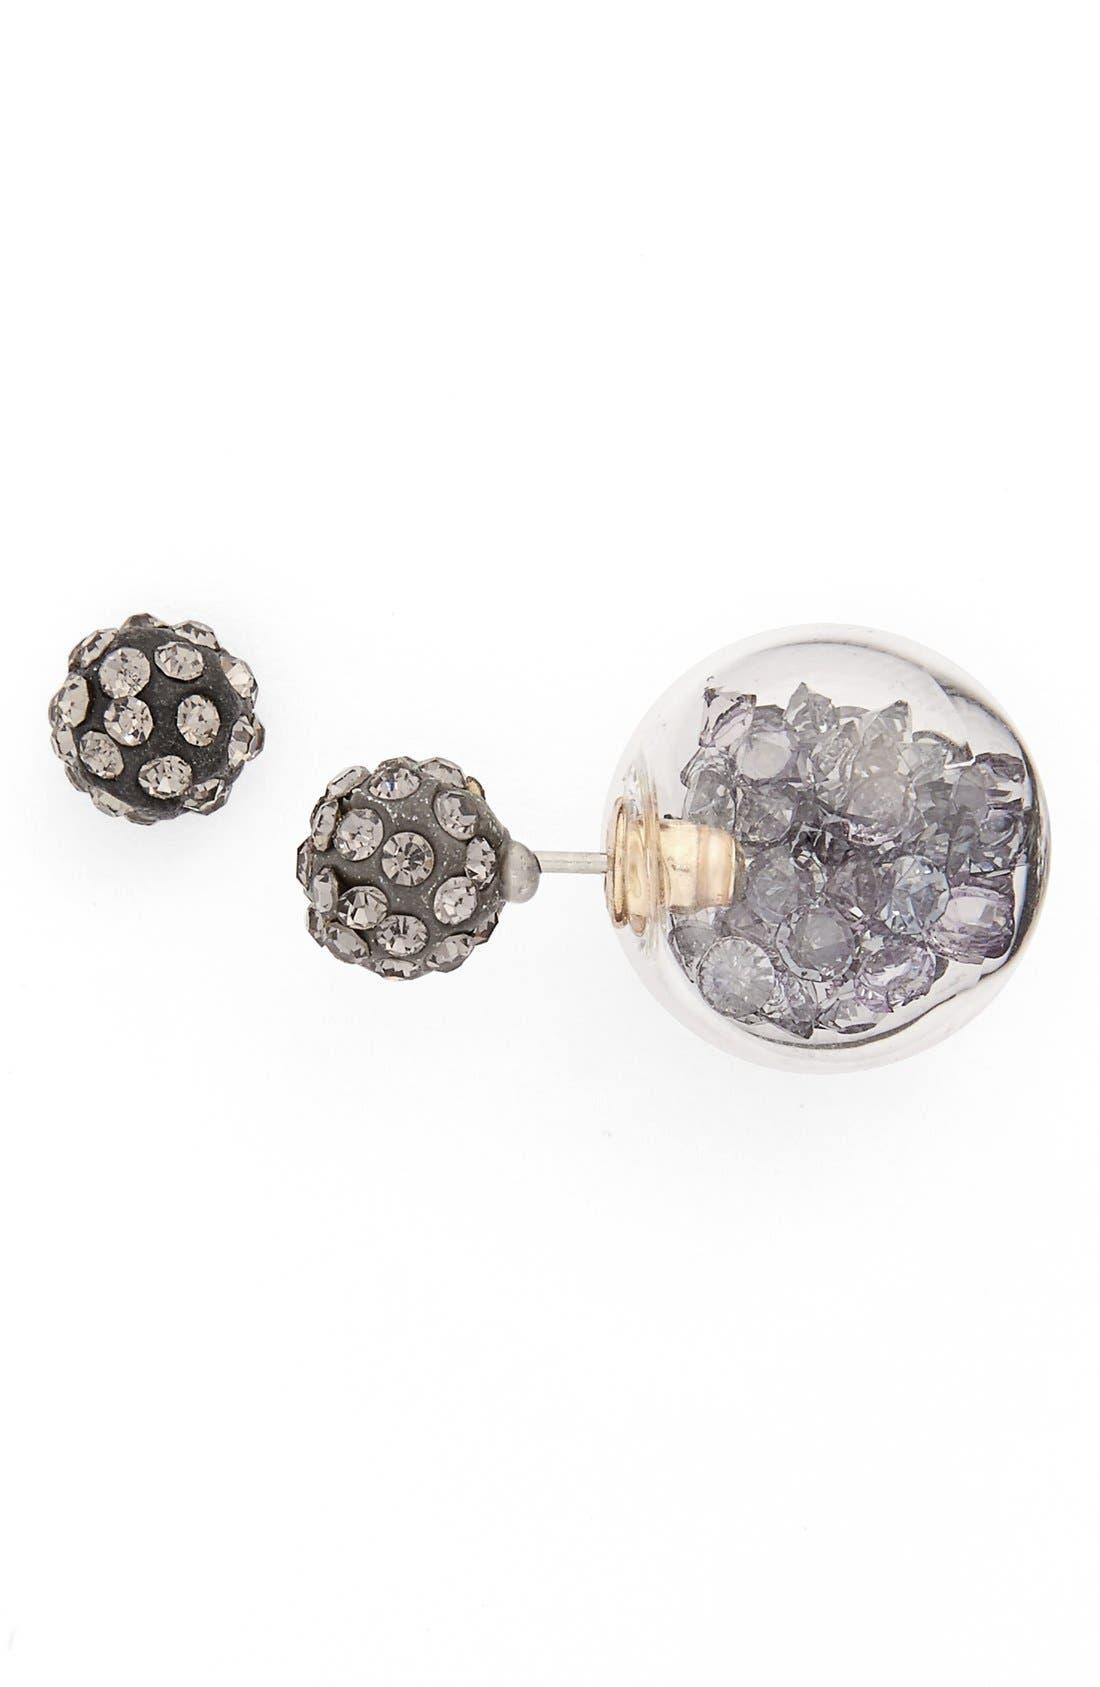 Main Image - Cara Crystal Front/Back Earrings